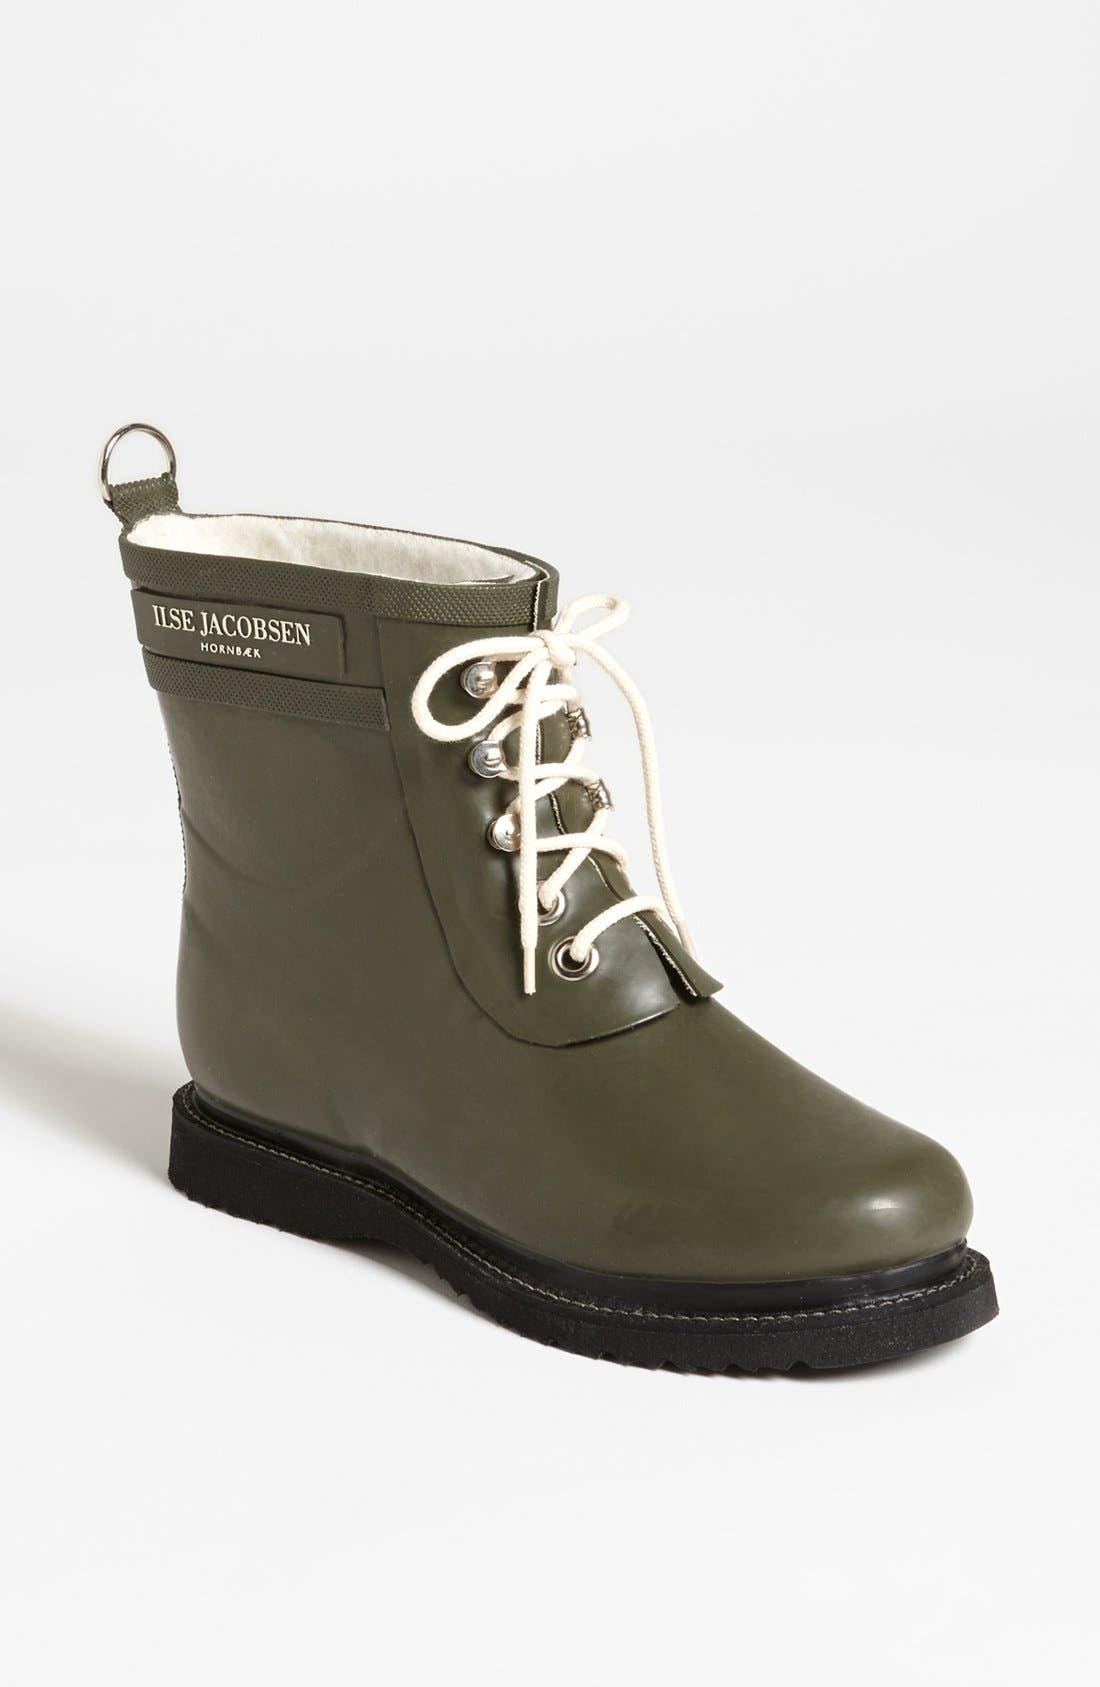 Ilse Jacobsen Hornbæk 'Rub' Boot